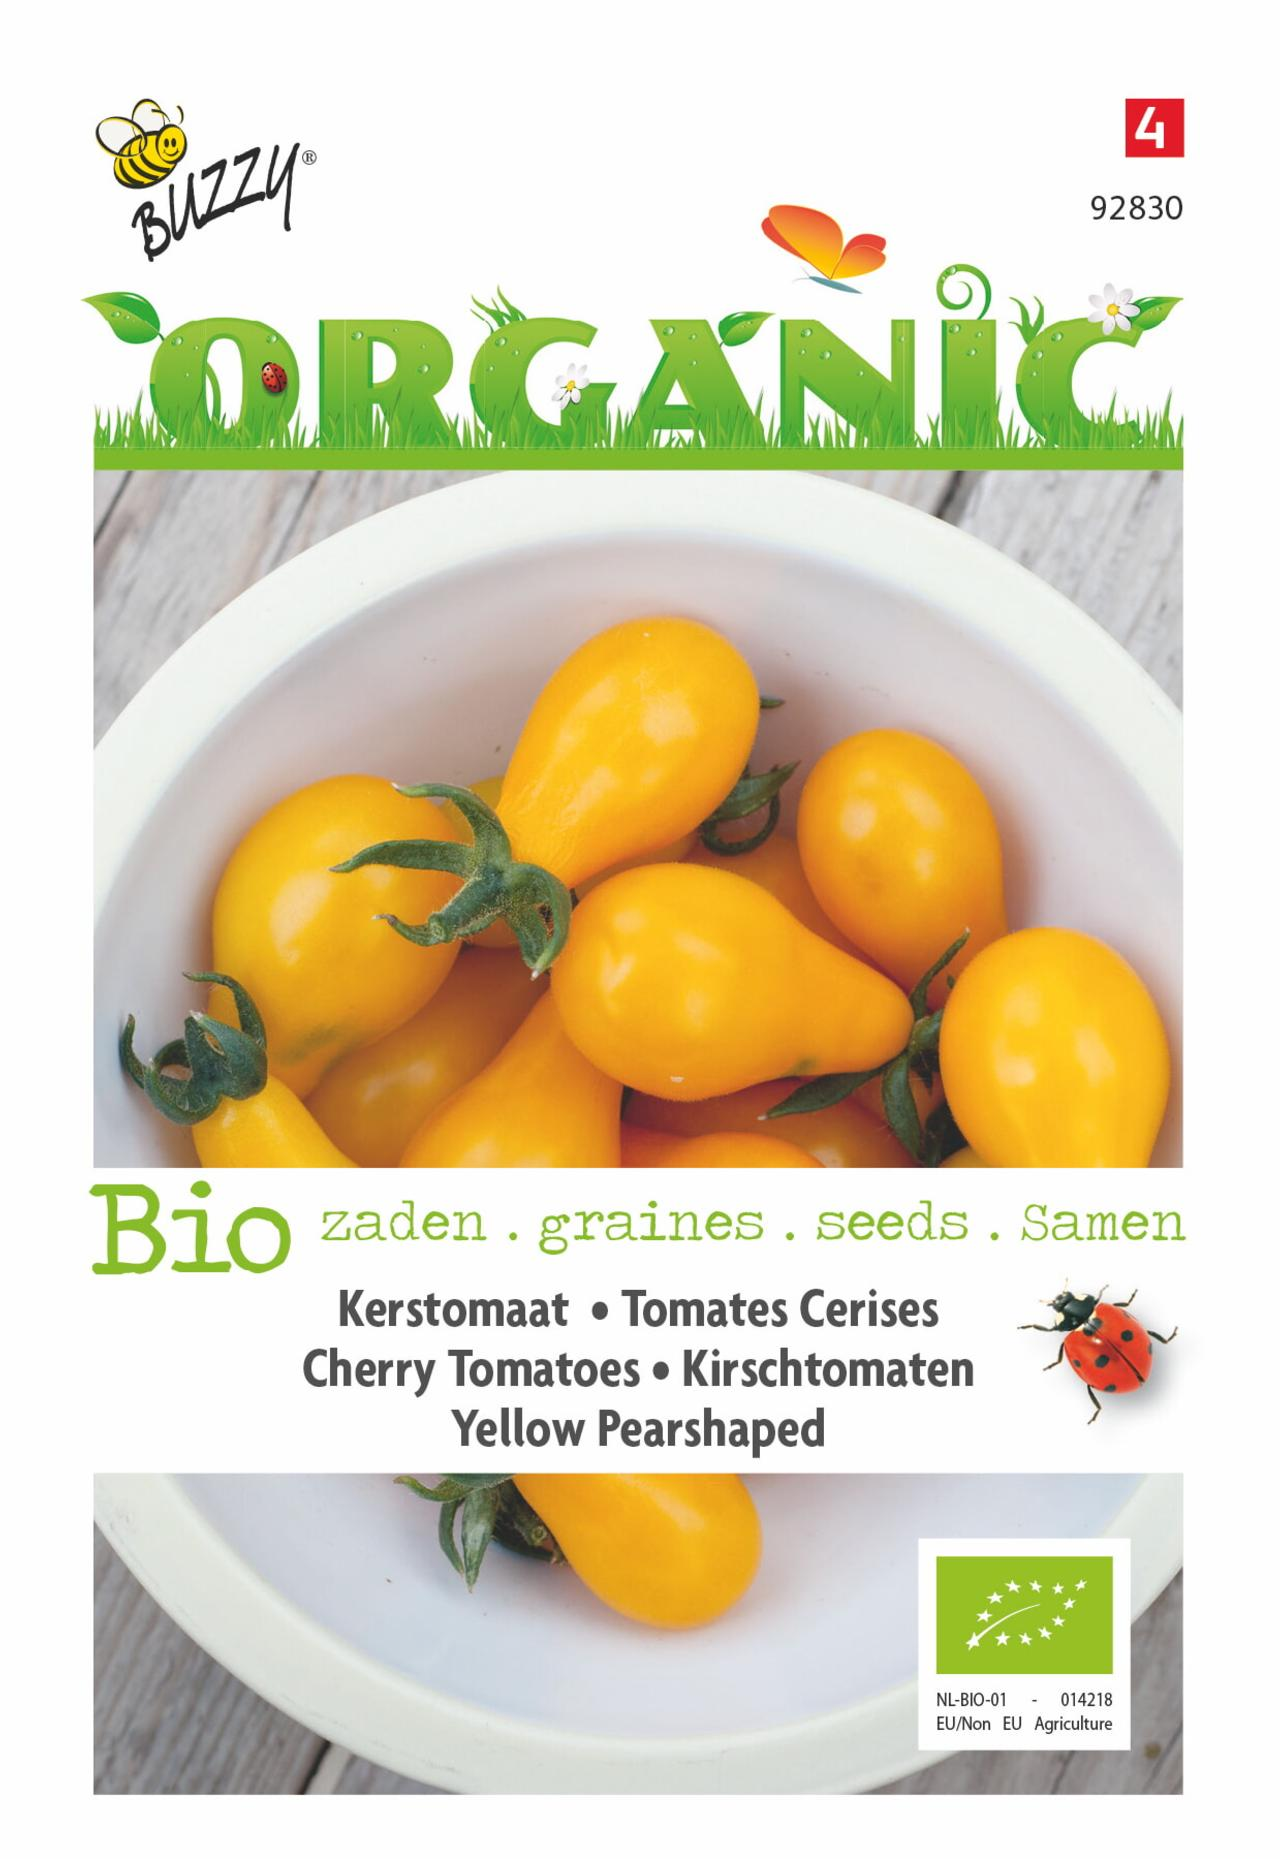 Solanum lycopersicum 'Yellow Pearshaped' (BIO) plant